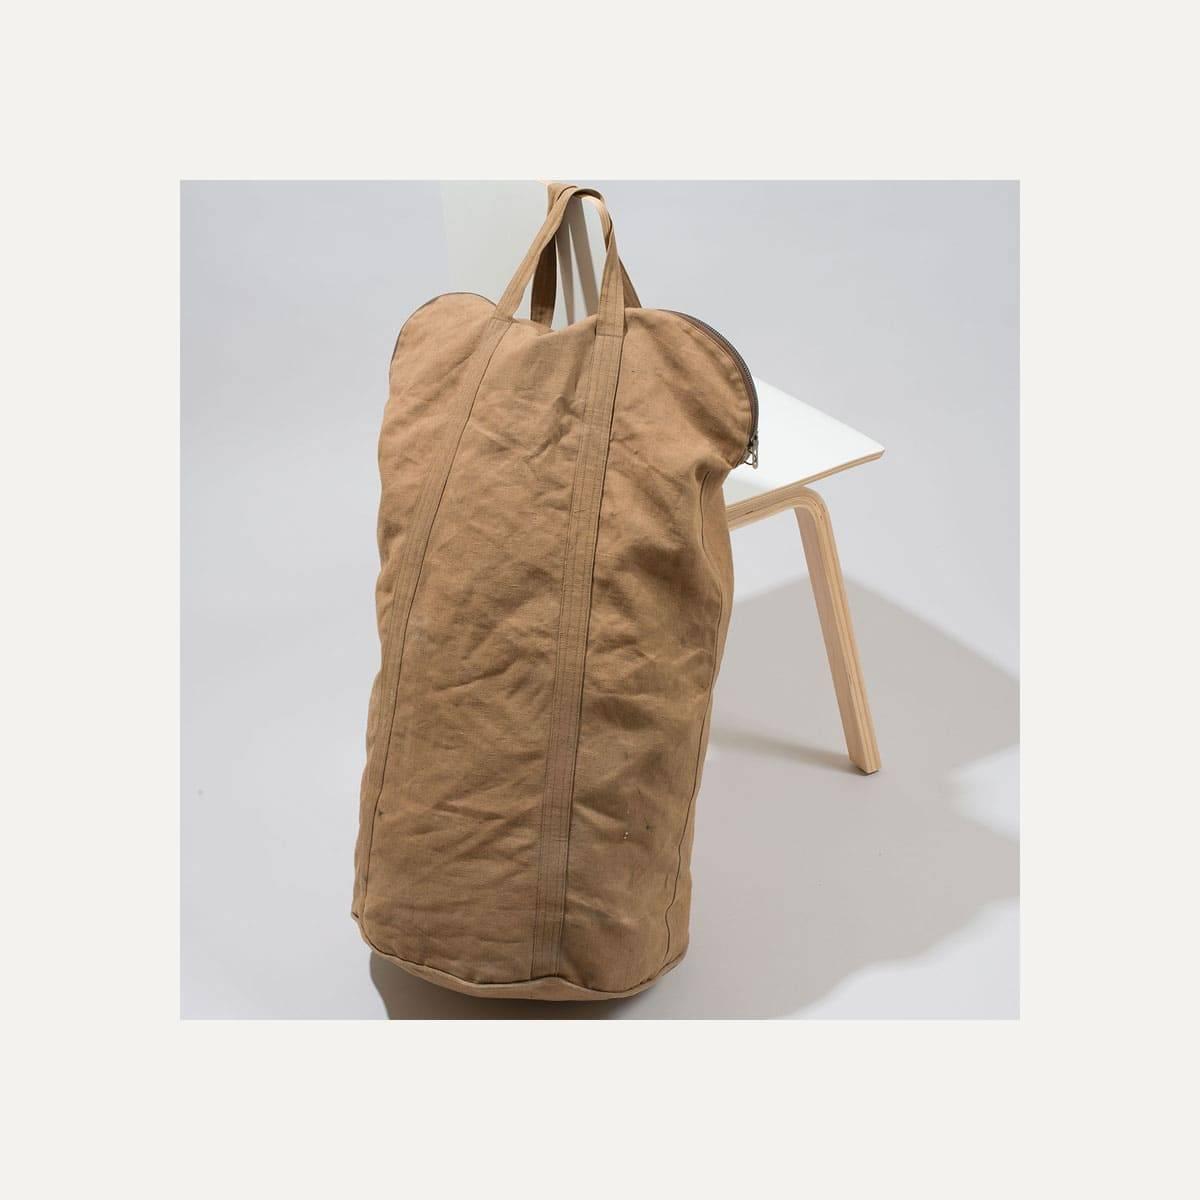 N°4: 'Cashew-colored' linen parachute bag (image n°8)